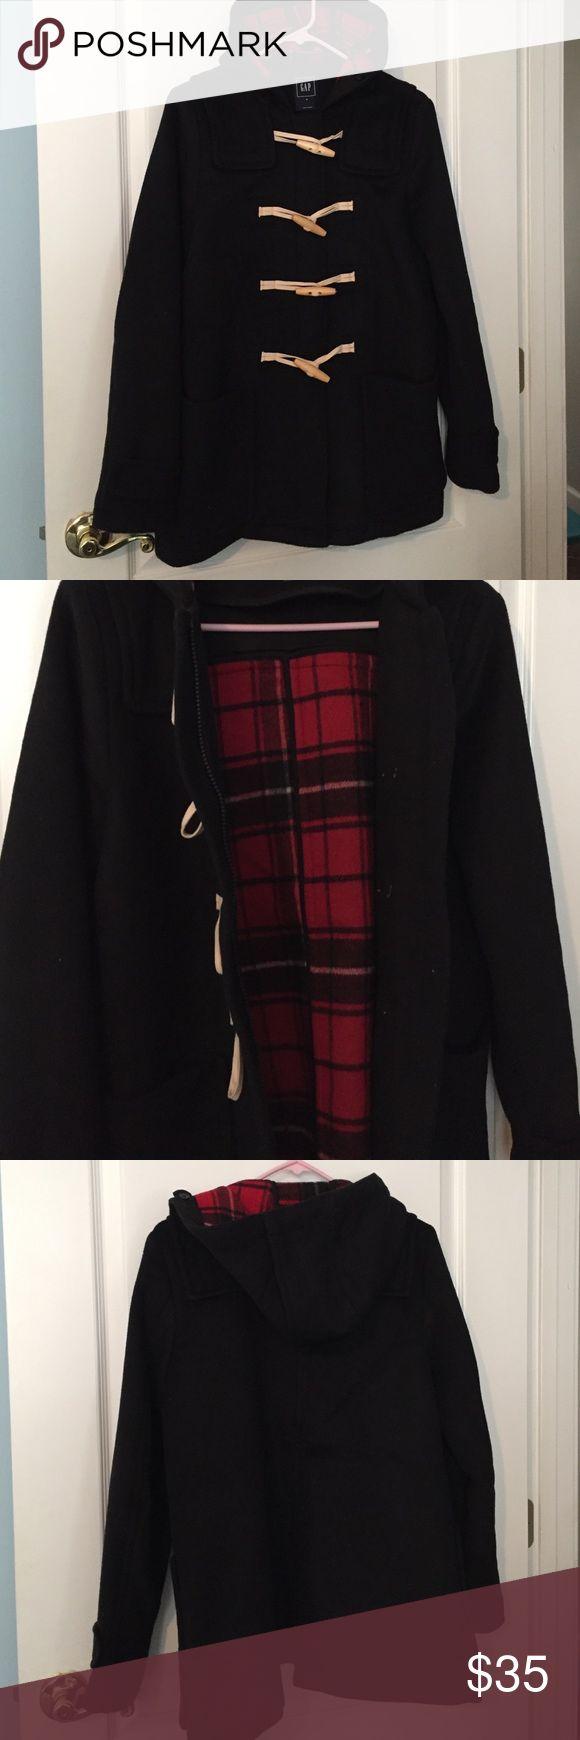 Gap duffle coat Black duffle coat. Plaid flannel-lined GAP Jackets & Coats